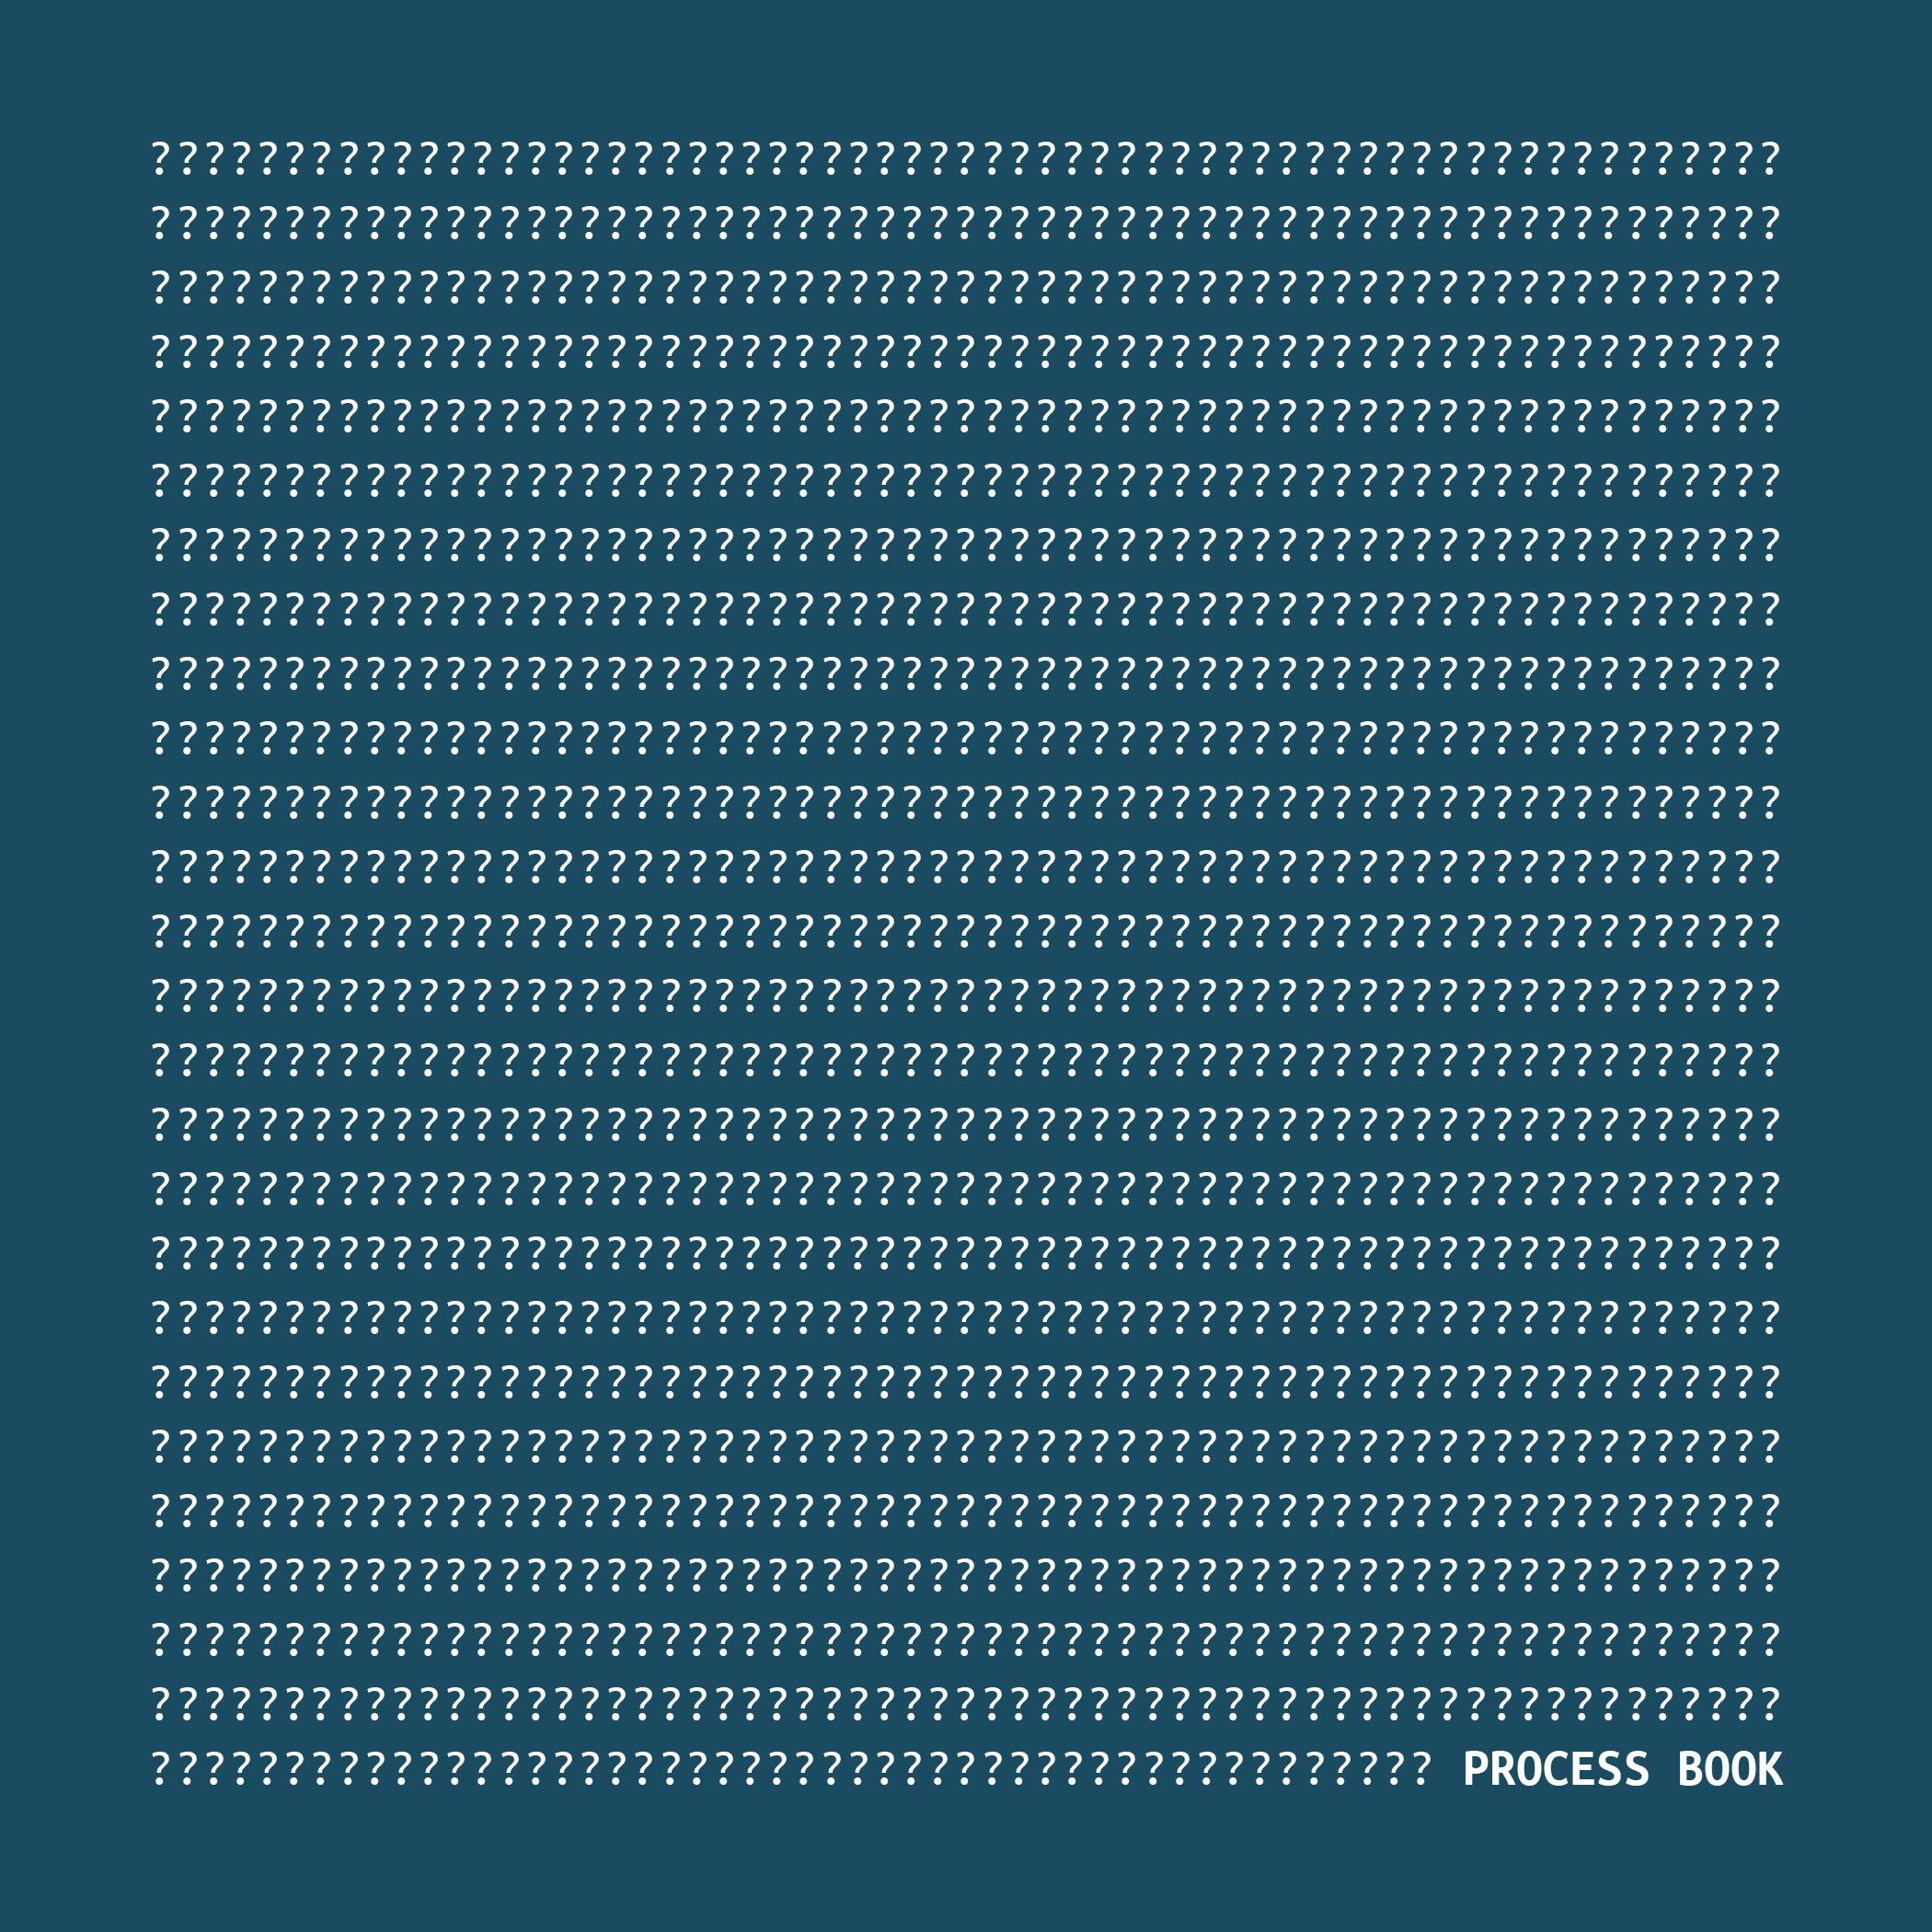 process book.jpg